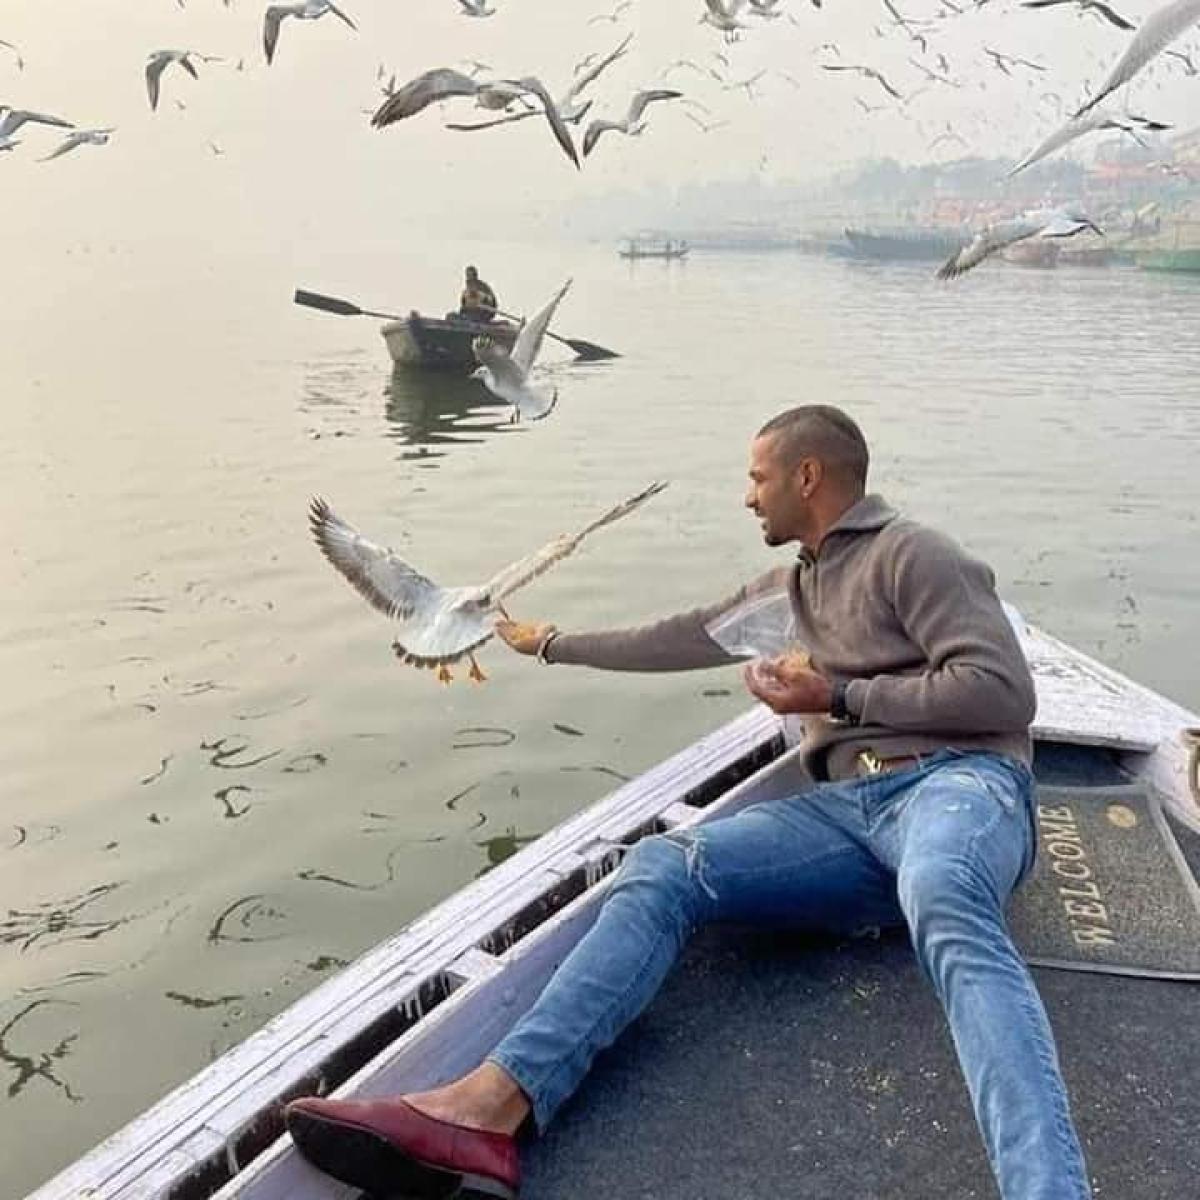 Bird flu: Action against boatman after picture of Shikhar Dhawan feeding birds in Varanasi goes viral